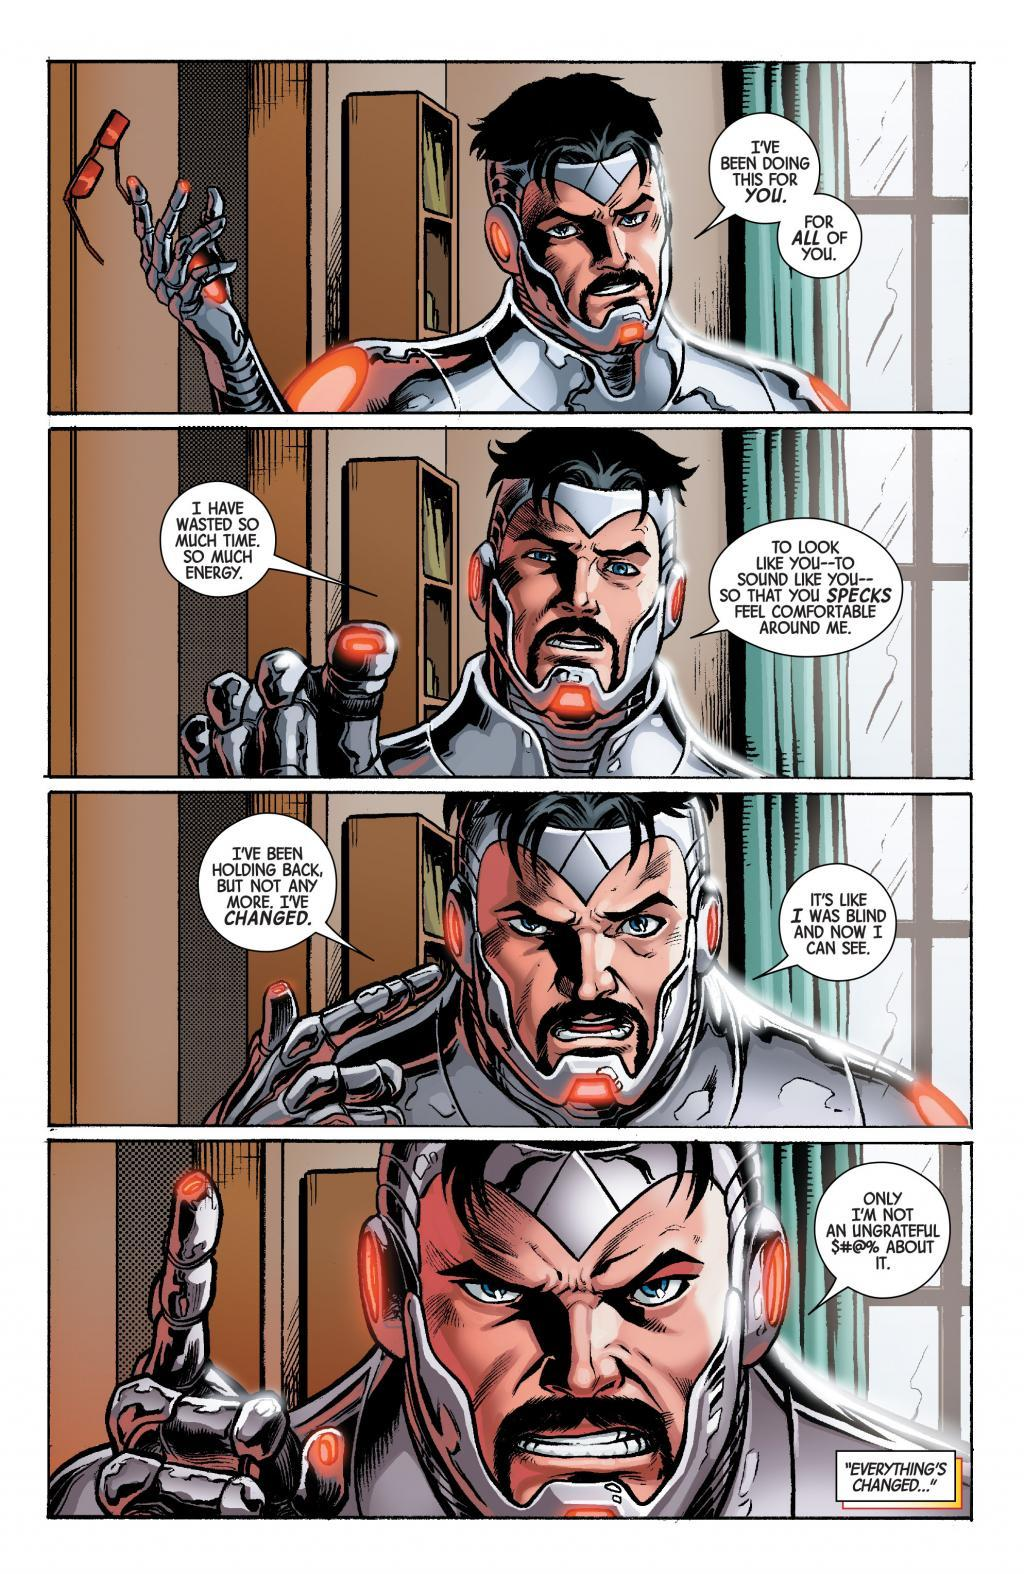 Superior Iron Man Backgrounds, Compatible - PC, Mobile, Gadgets| 1024x1574 px